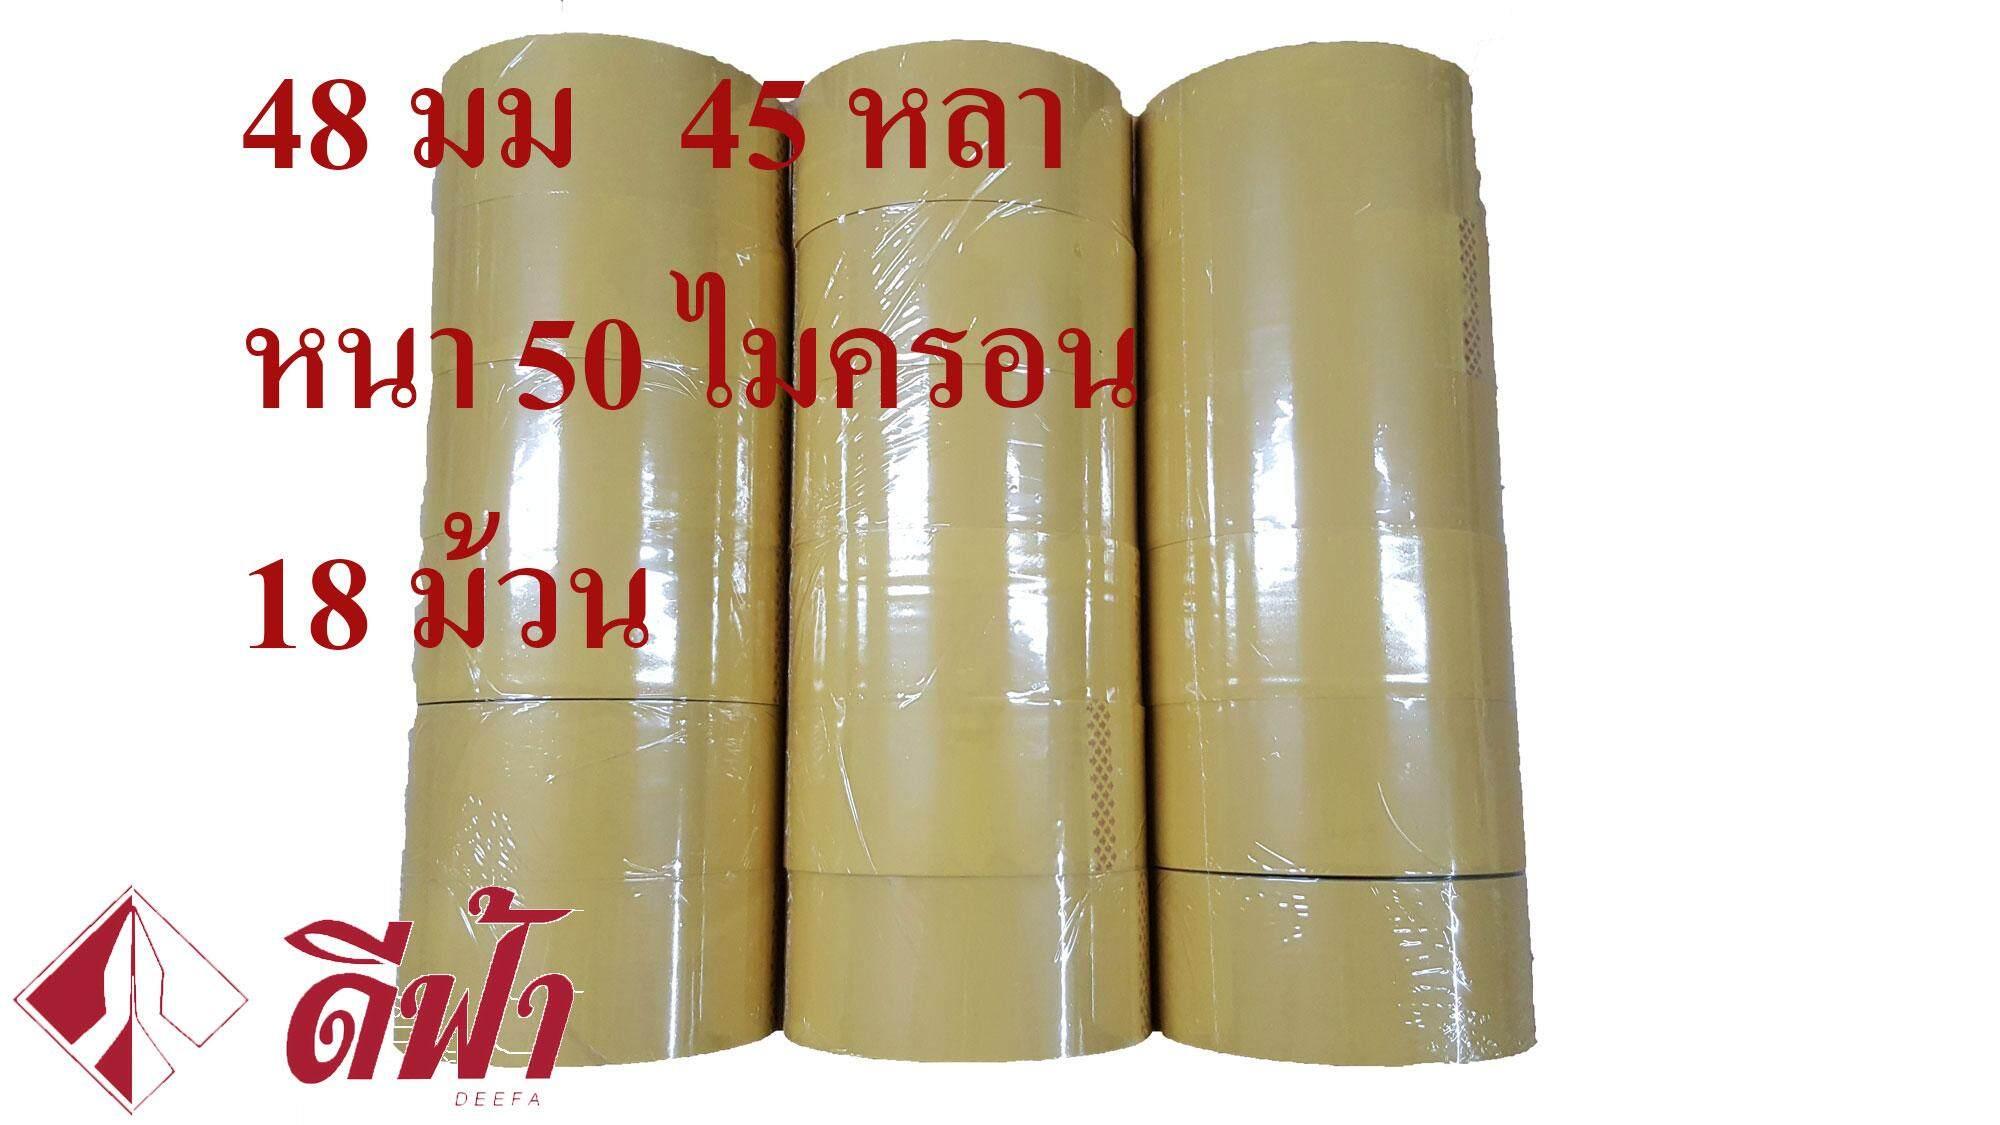 Deefa-T4845b=18 ม้วน(3 แพ็ค)(14.39 บาท/ม้วน) เทปสีชา เทปโอพีพี กว้าง 48มม,ยาว 45หลา,หนา 50 ไมครอน หนา ยาวเต็มไม่โกง ไม่มีฟองอากาศ (เทปปิดกล่อง, เทปกาว, Opp Tape, เทป Opp, เทปสำหรับปิดกล่อง, เทป Opp ปิดกล่อง,เทปสีน้ำตาล,โอพีพีเทป, สก๊อตเทป, สก็อตเทปสีชา) By Deefa.